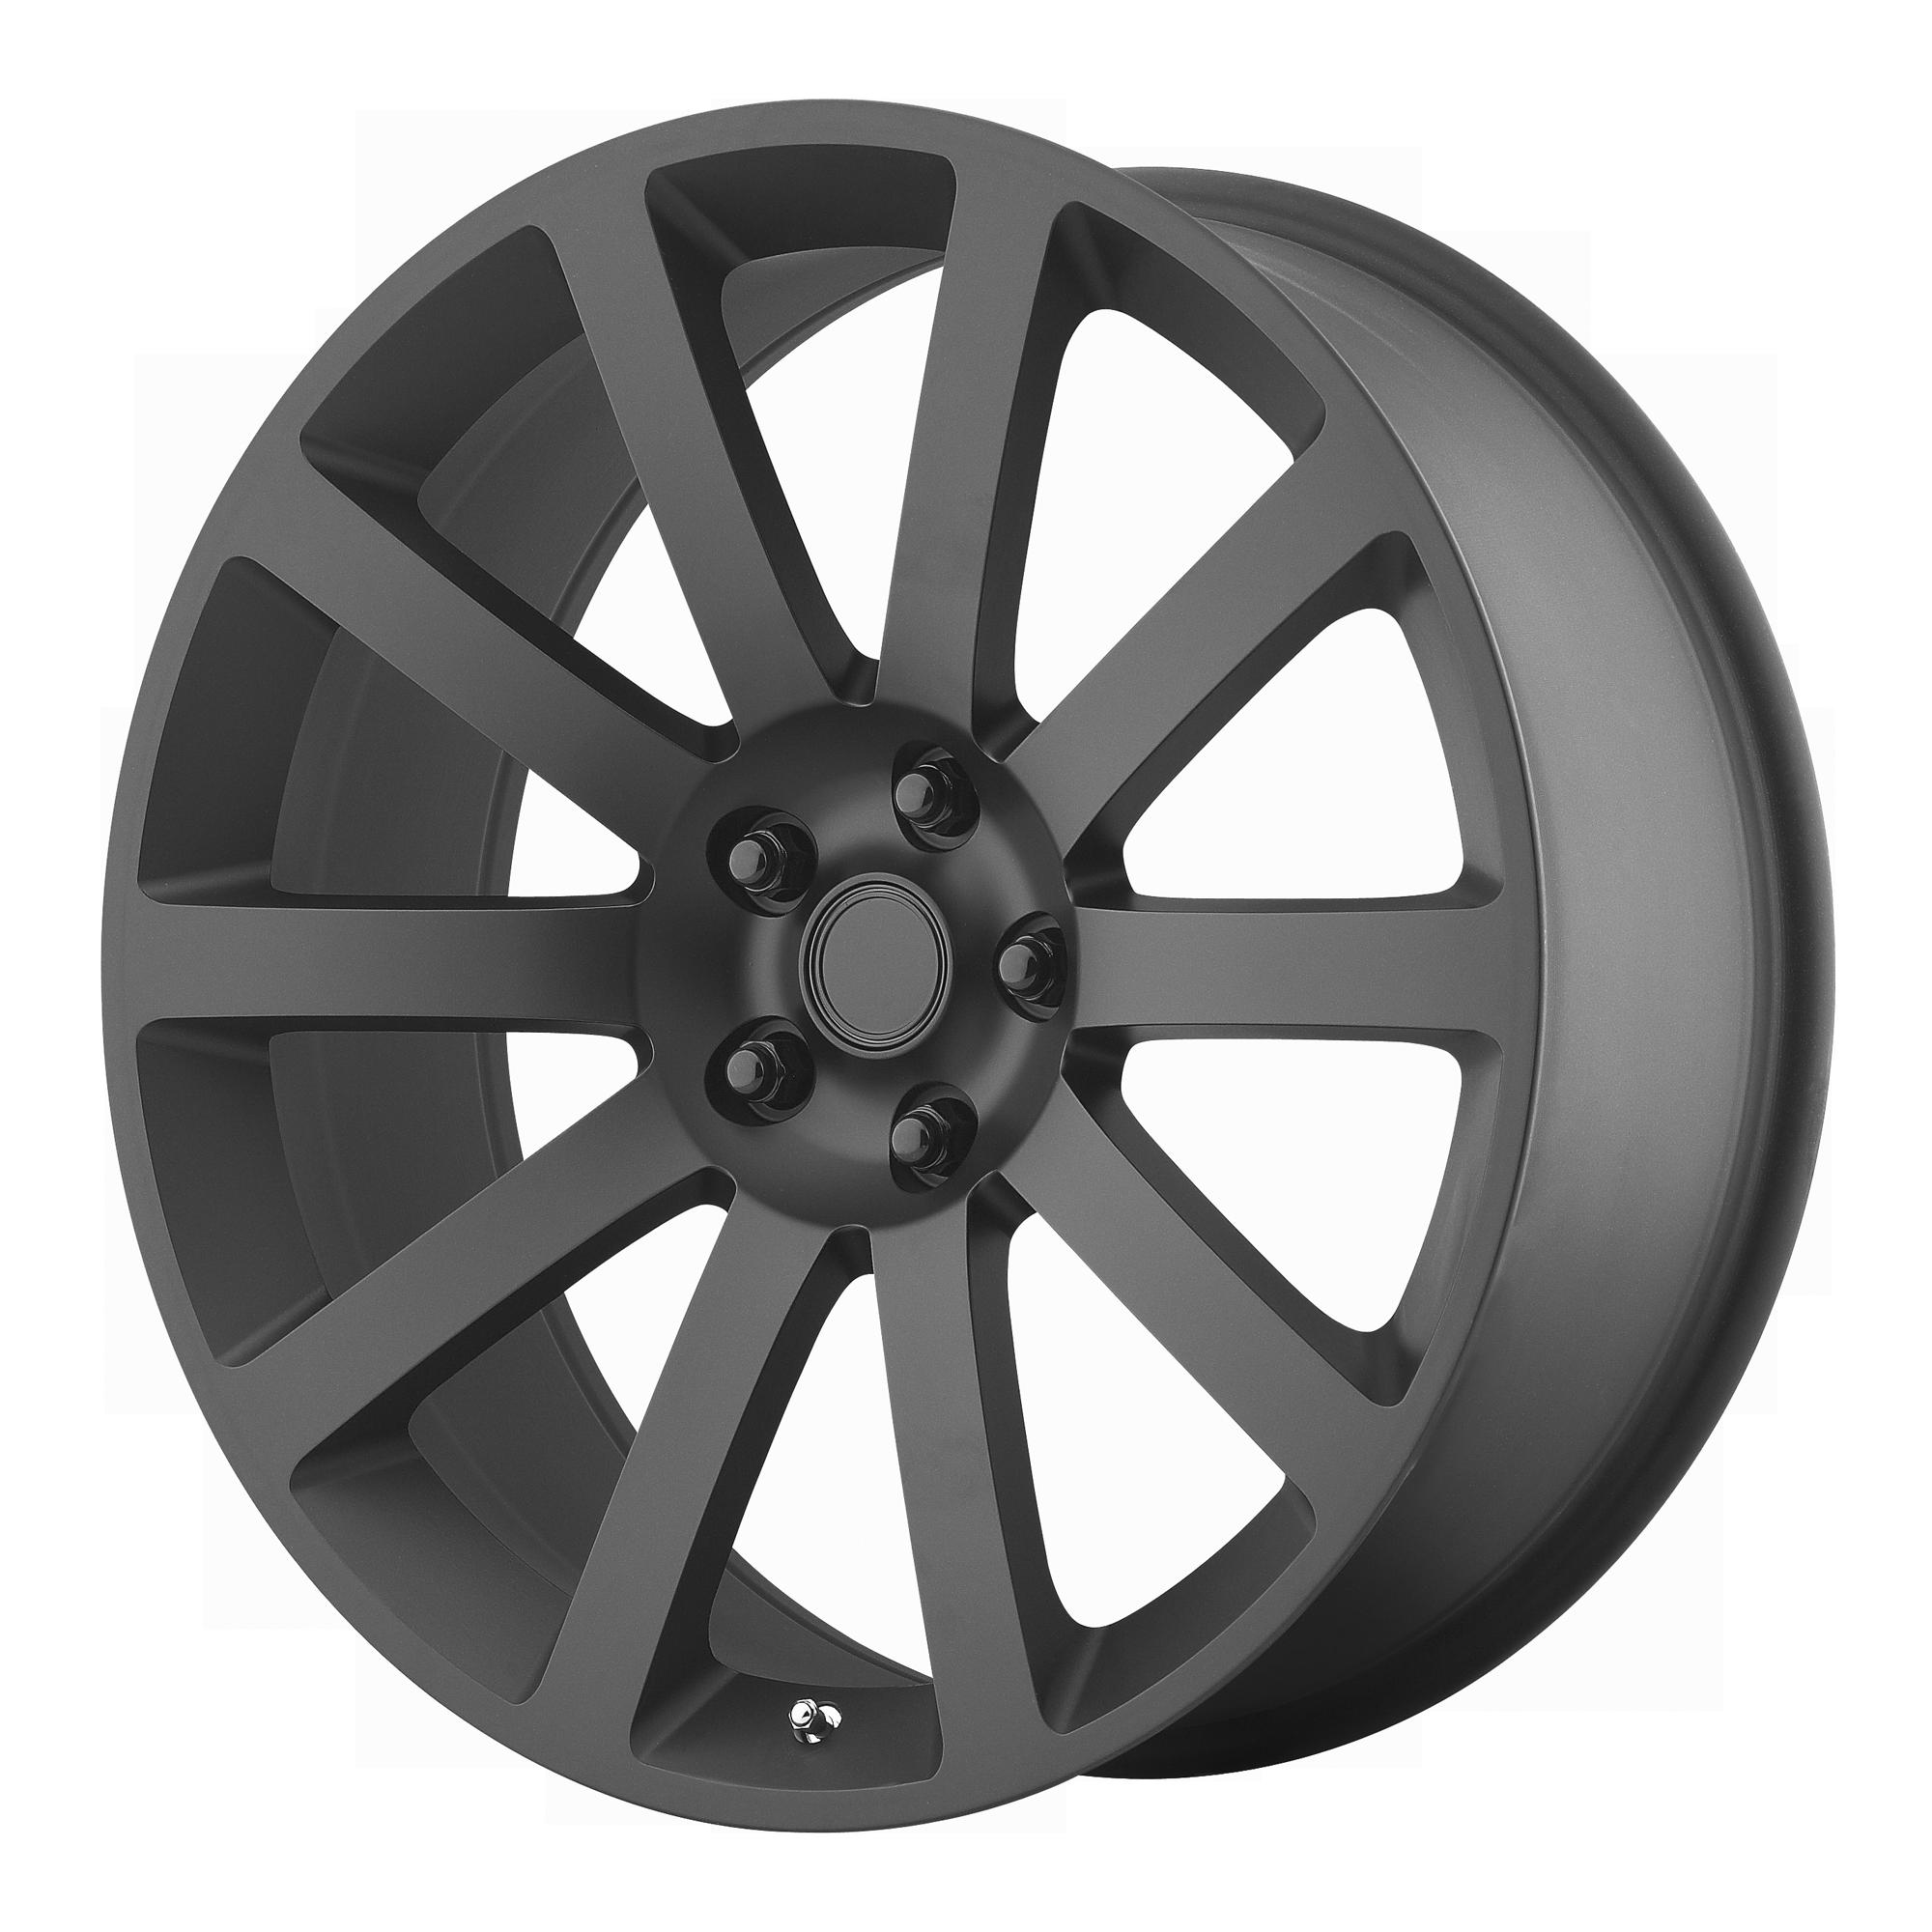 OE Creations Replica Wheels OE Creations PR146 Matte Black